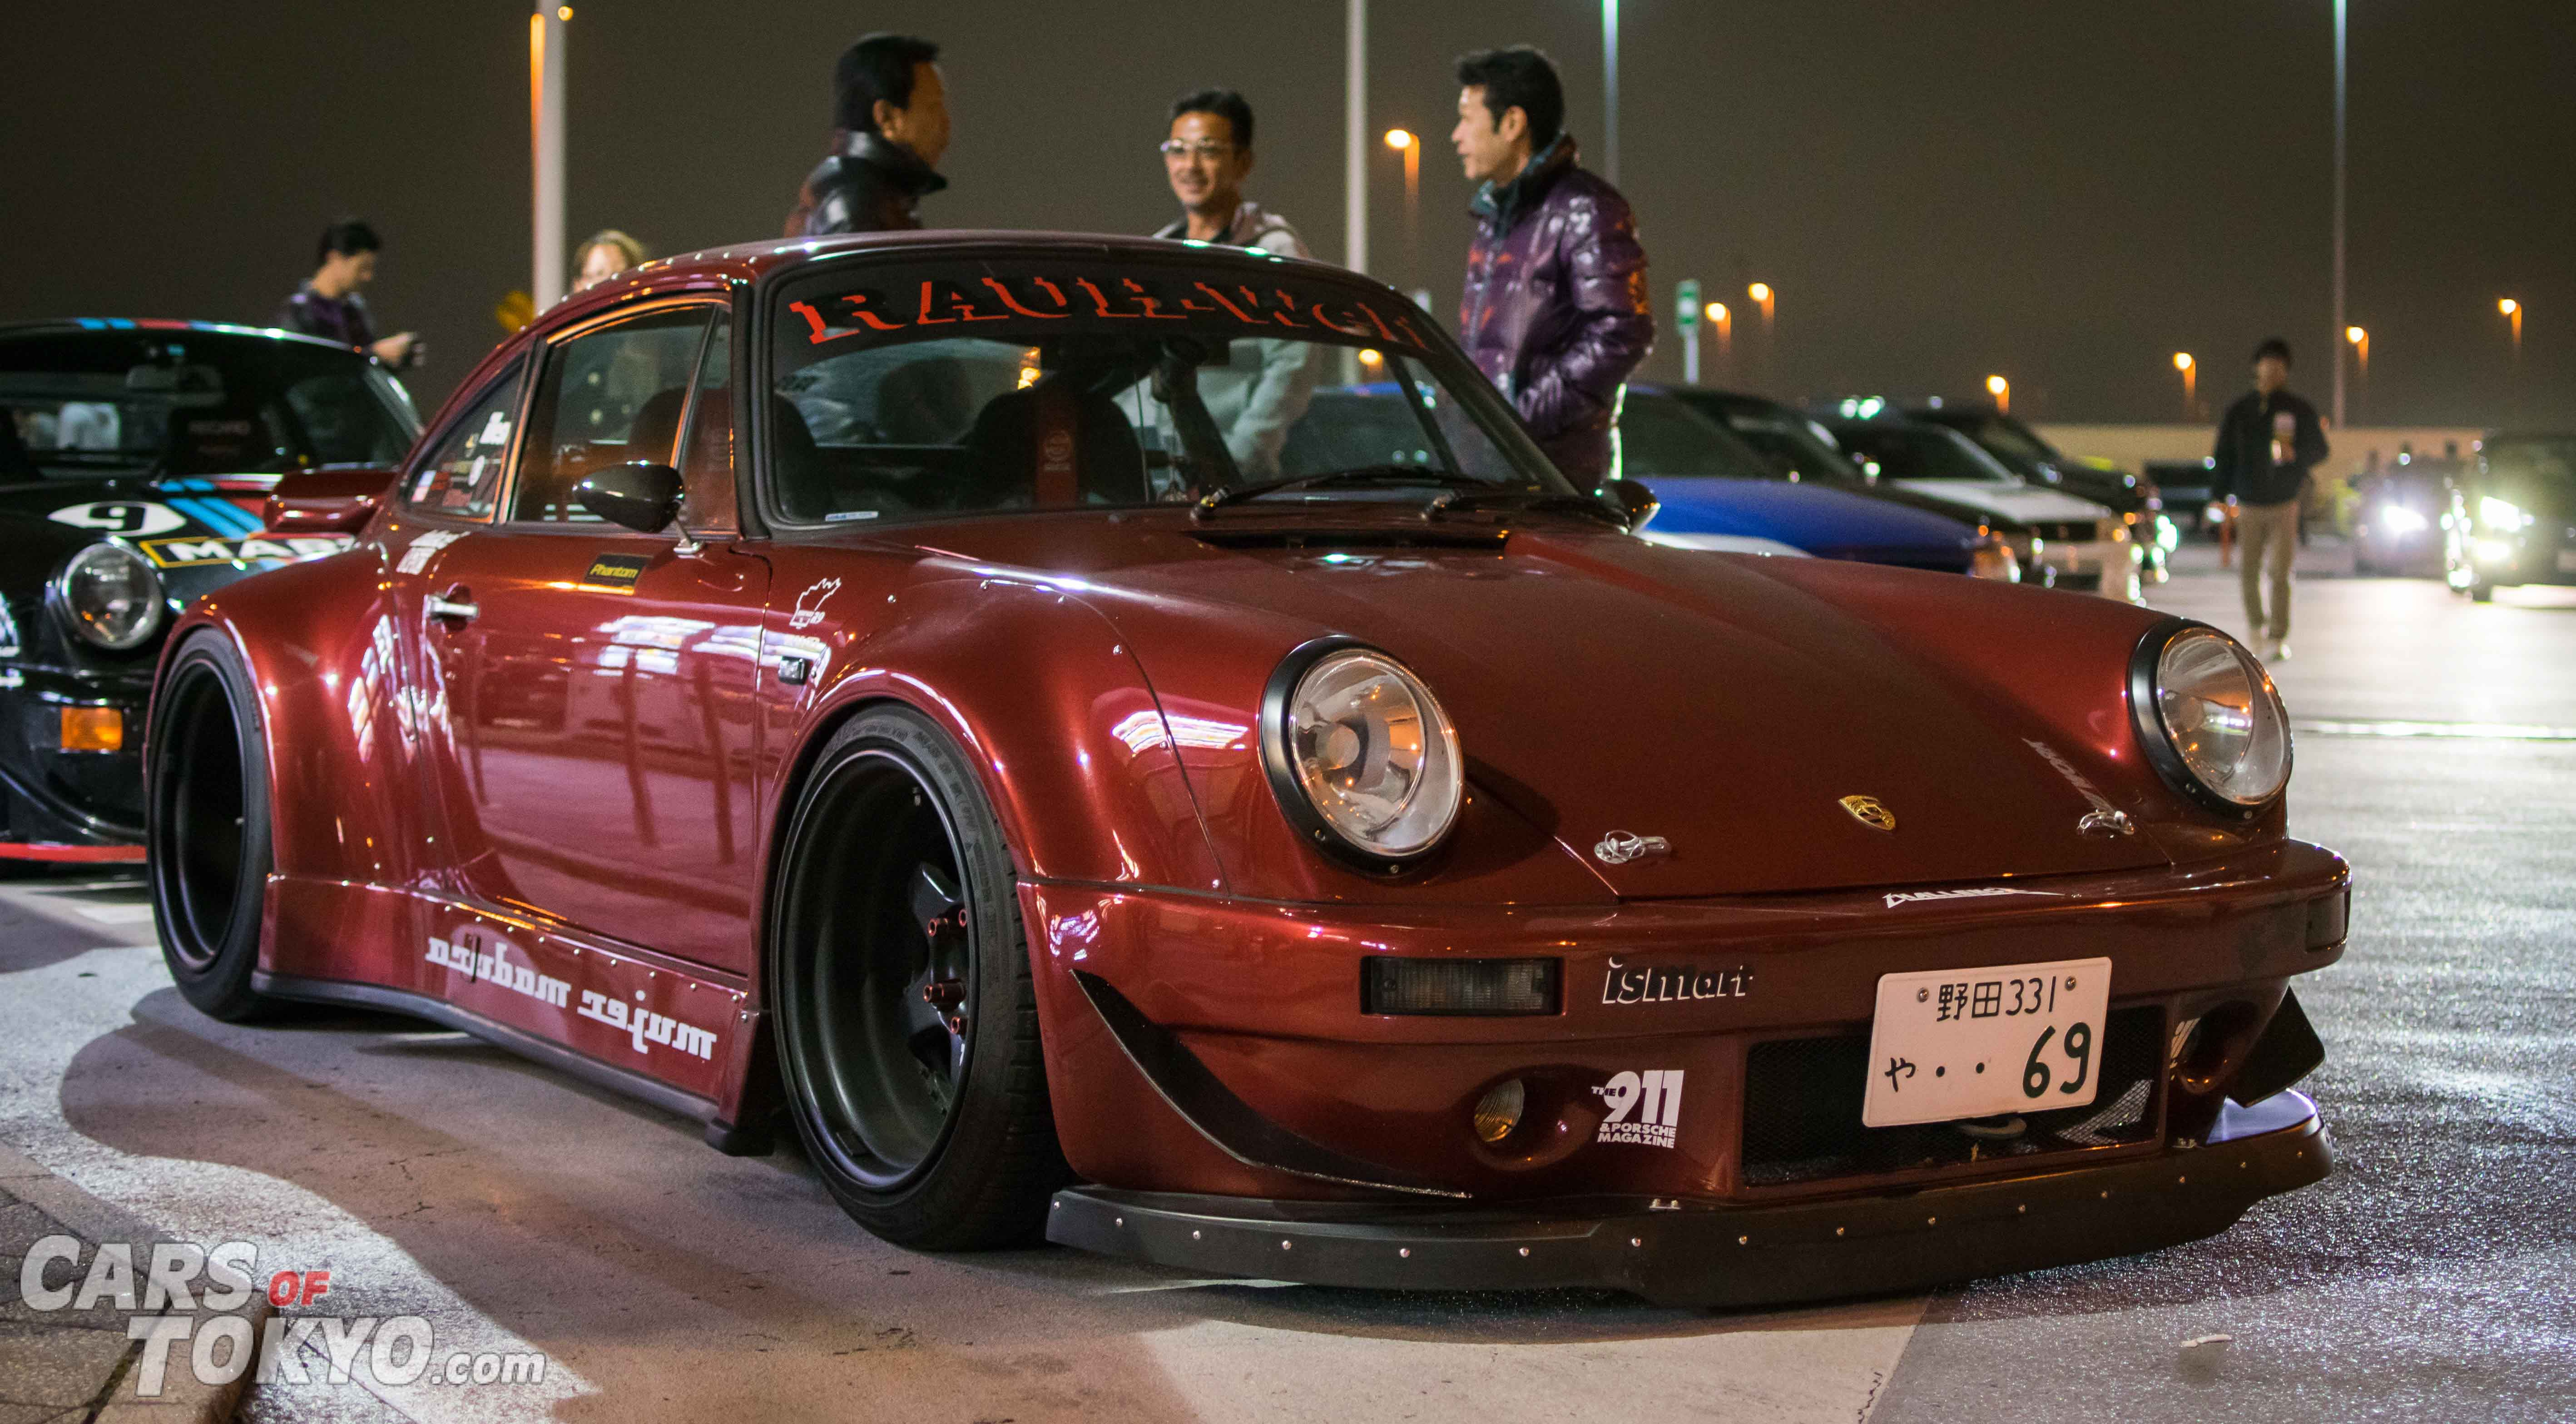 Cars of Tokyo Tatsumi RWB 911